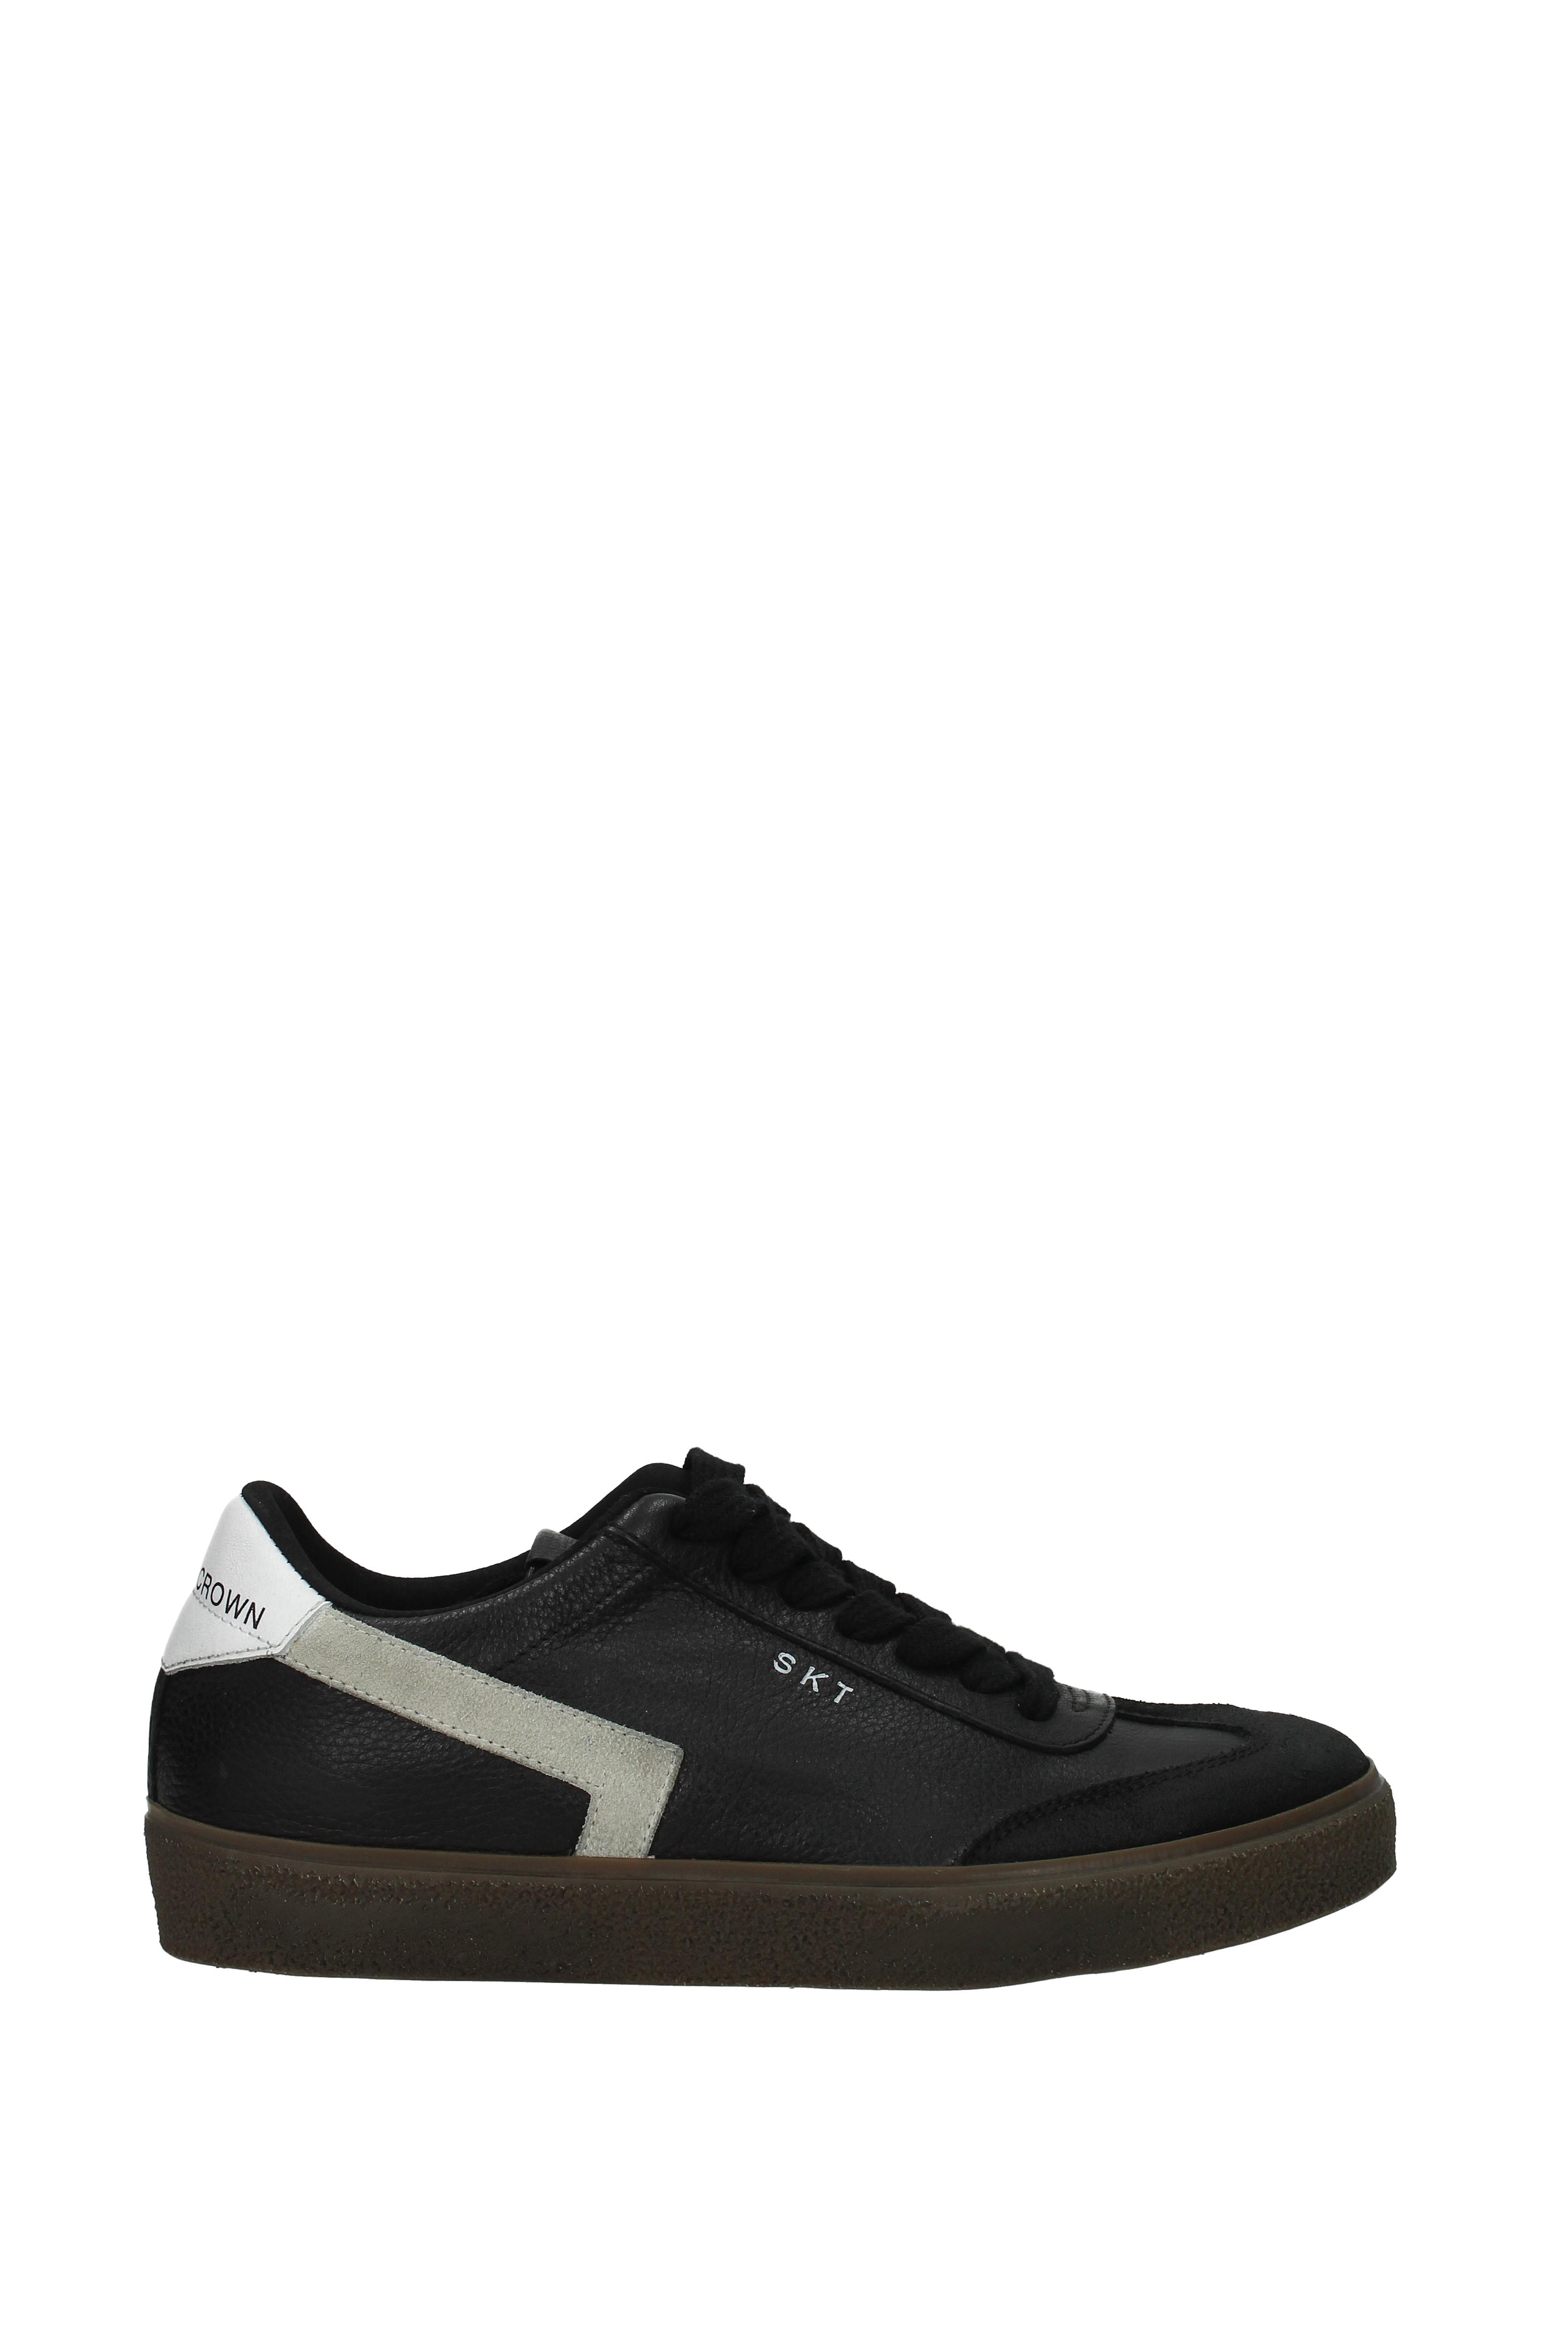 Sneakers Leder Leder Leder Crown Herren - Leder (MLC791) 0f833d